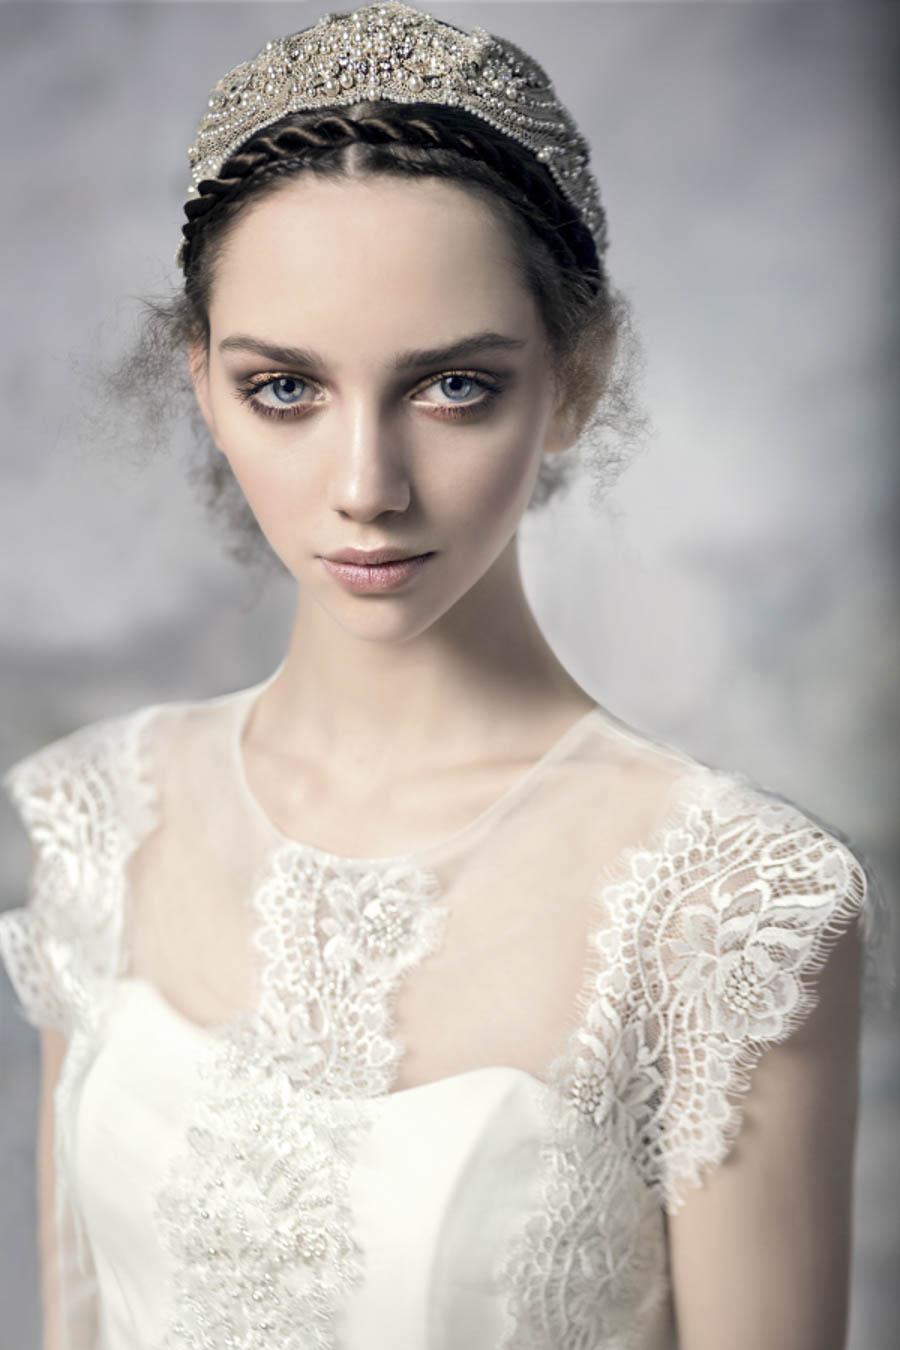 Swan Princess by Andrey Yakovlev Lili Aleeva